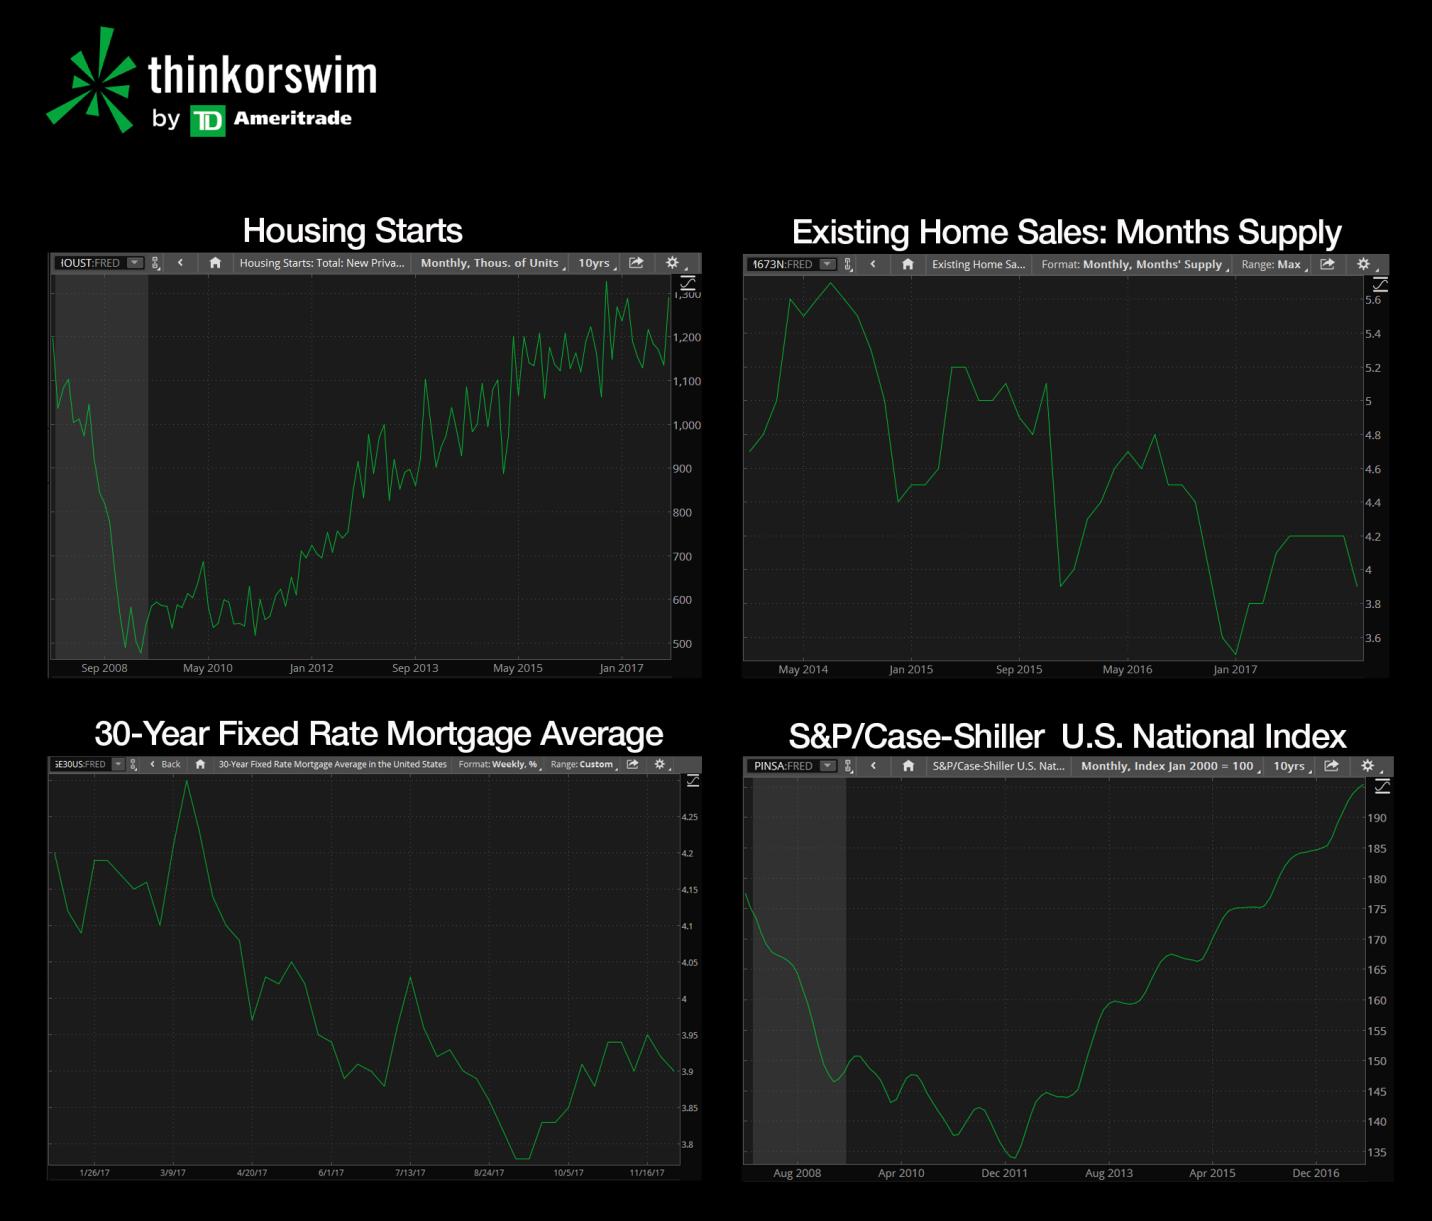 Thinkorswim charts showing different aspects of housing market economic data